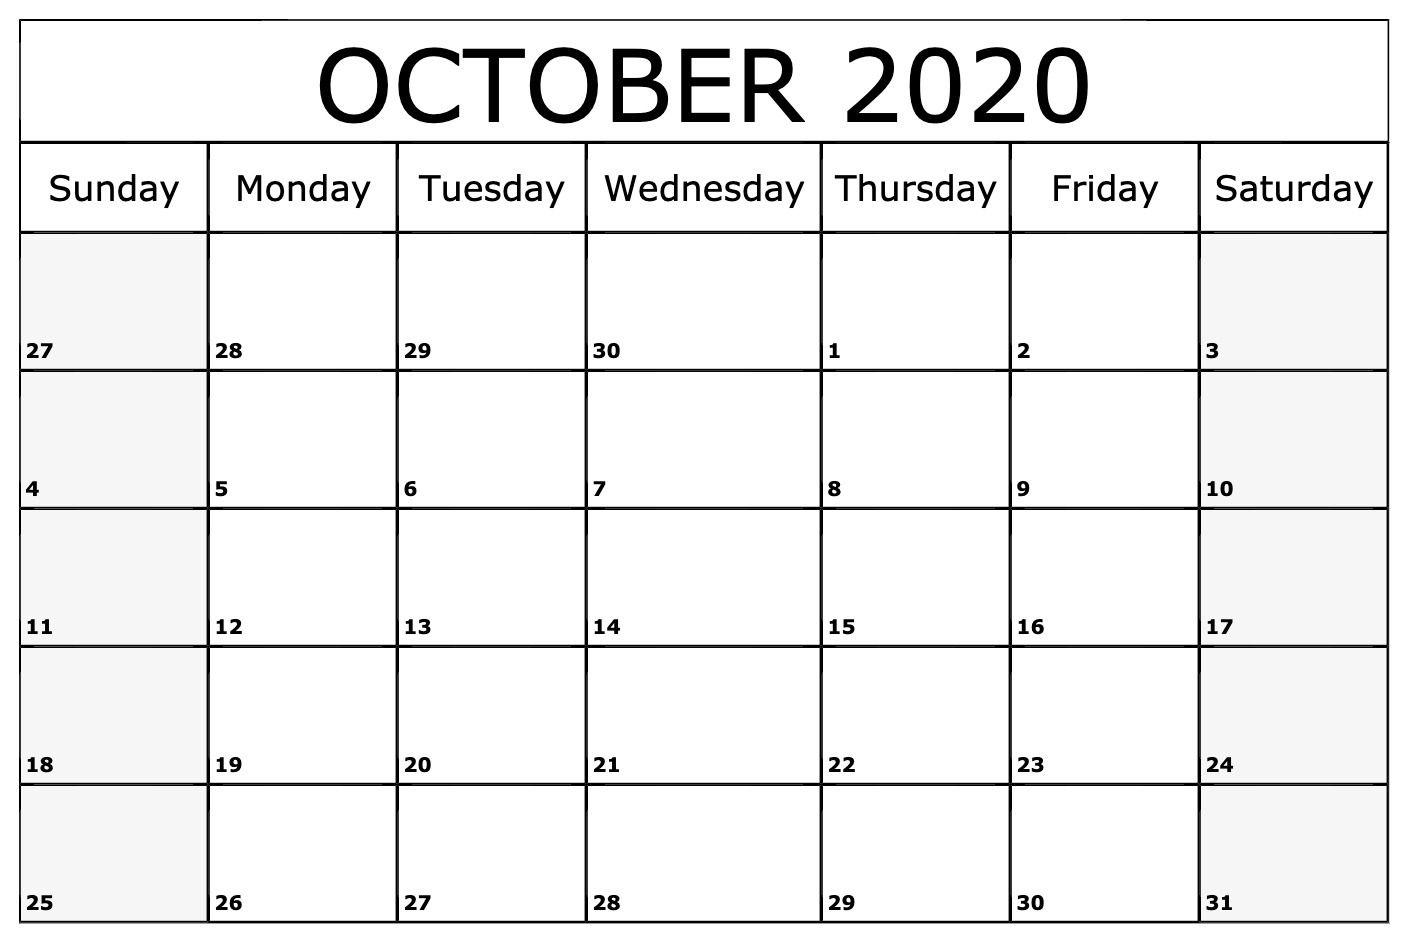 October Calendar 2020 Printable.2020 October Calendar 2020 Calendar Template October